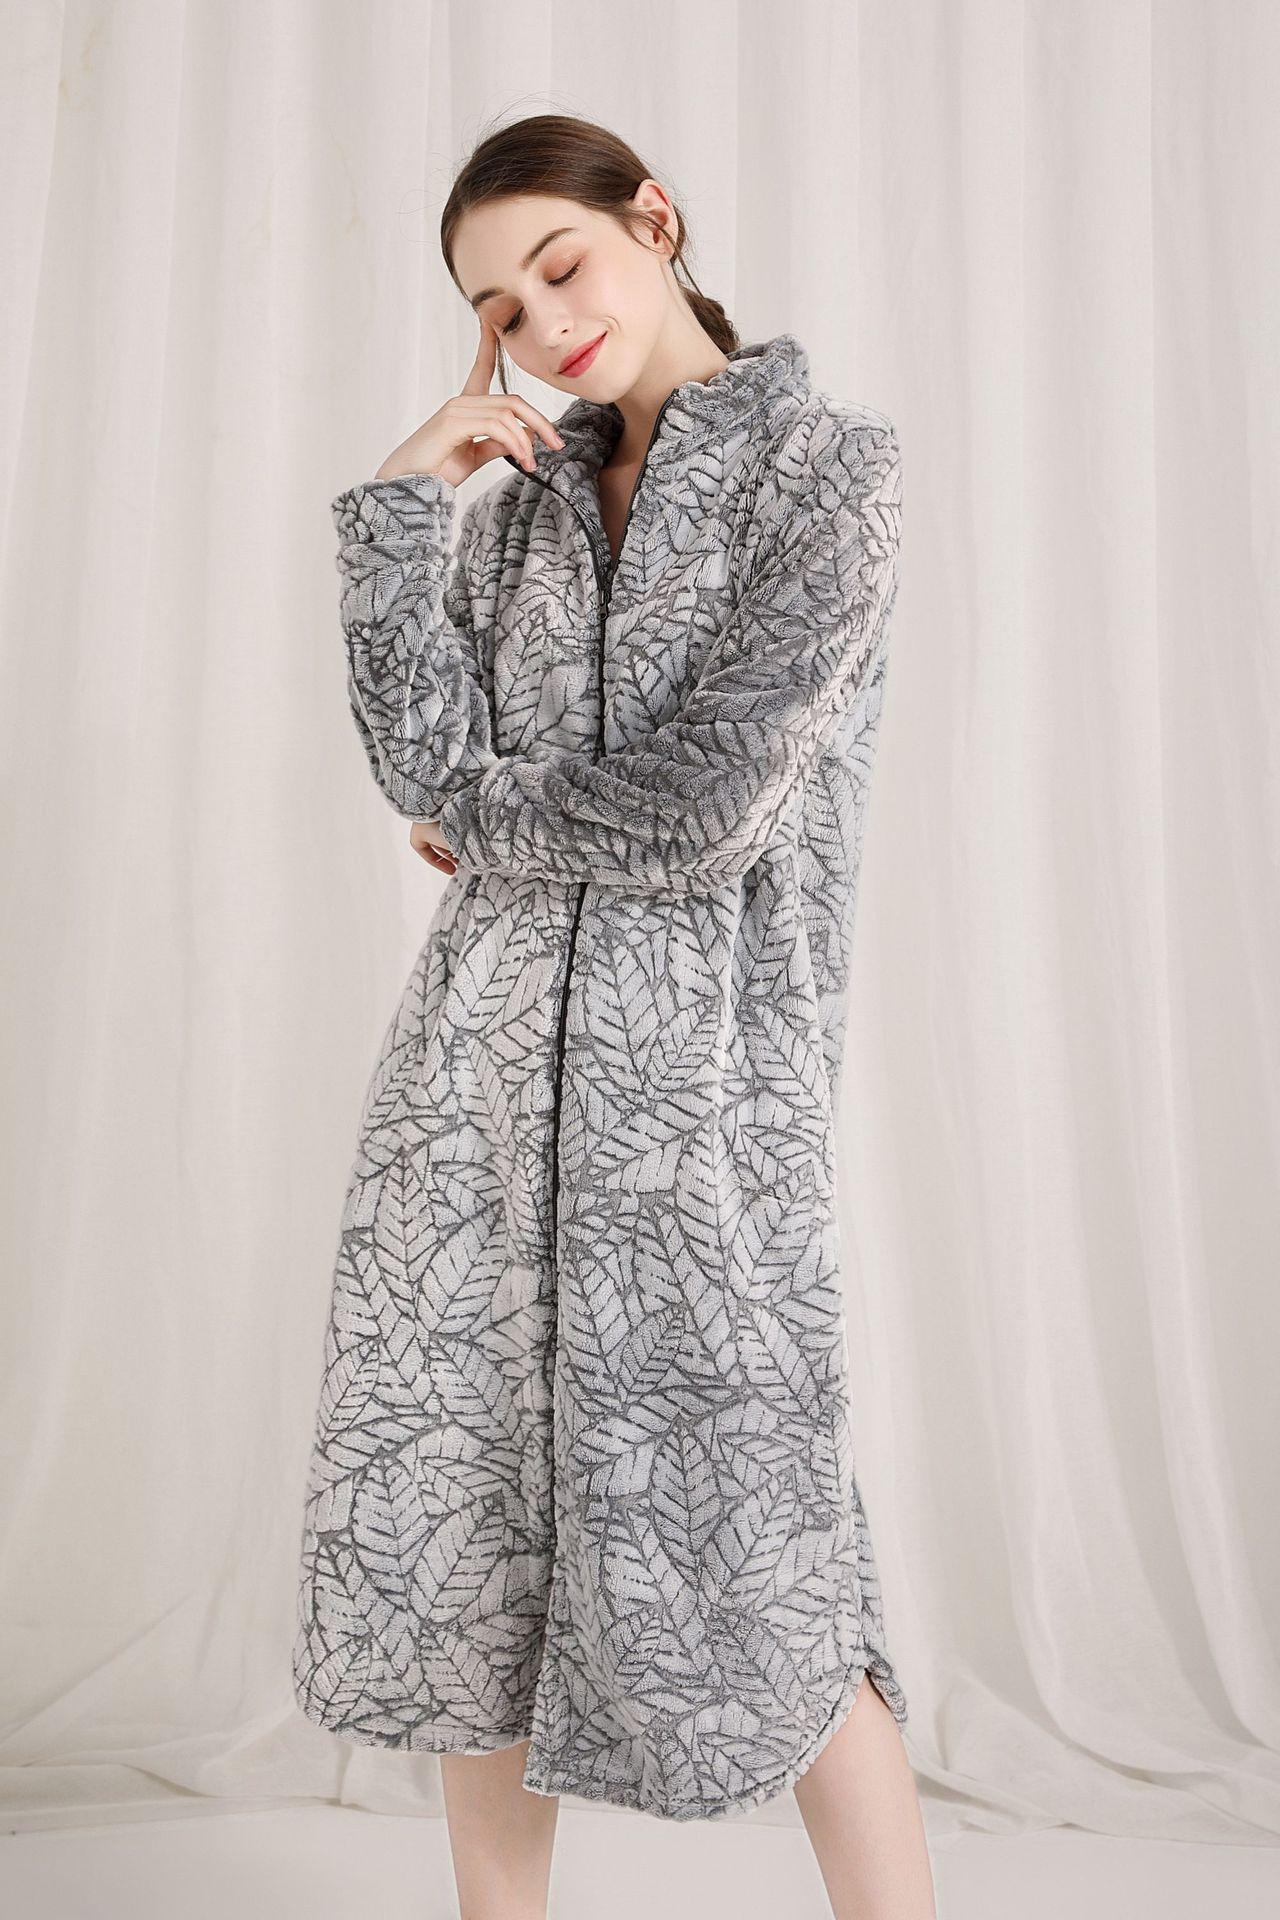 Image 2 - Fashion Coral velvet long robes women sexy sleepwear long sleeve thicken warm Quality zipper bathrobes women winter kimono robes-in Robes from Underwear & Sleepwears on AliExpress